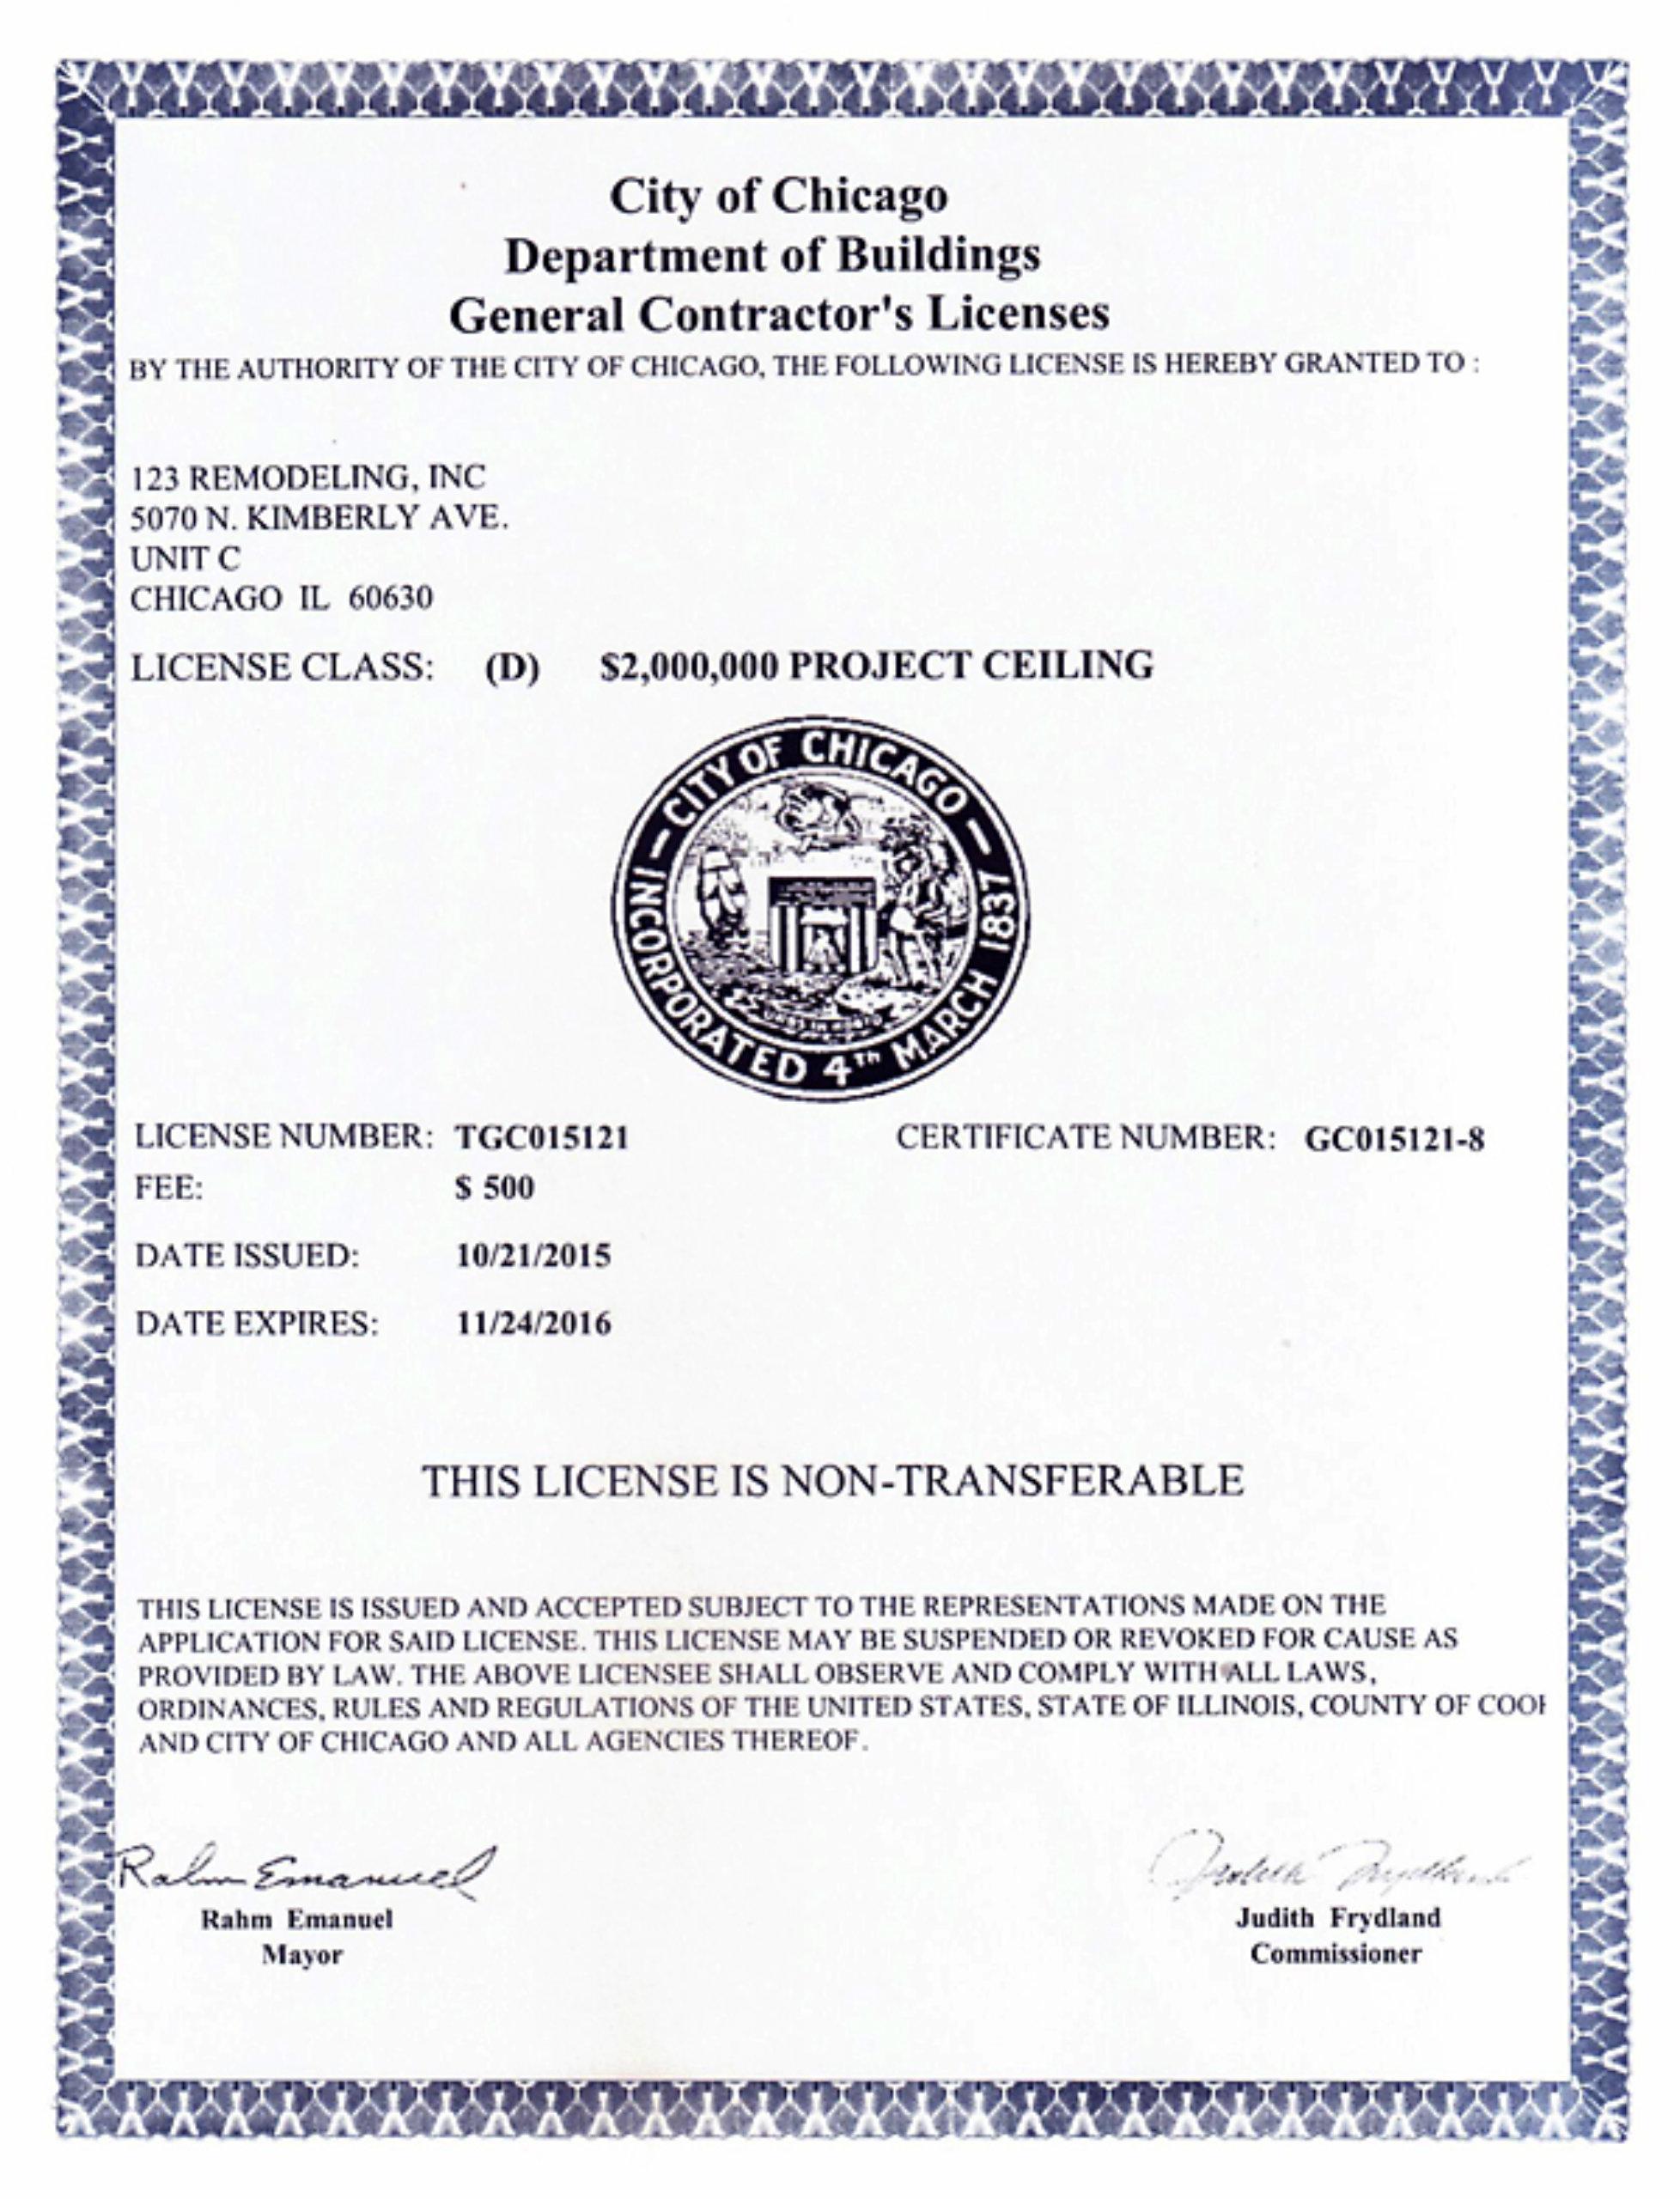 General Contractor License 2015-2016